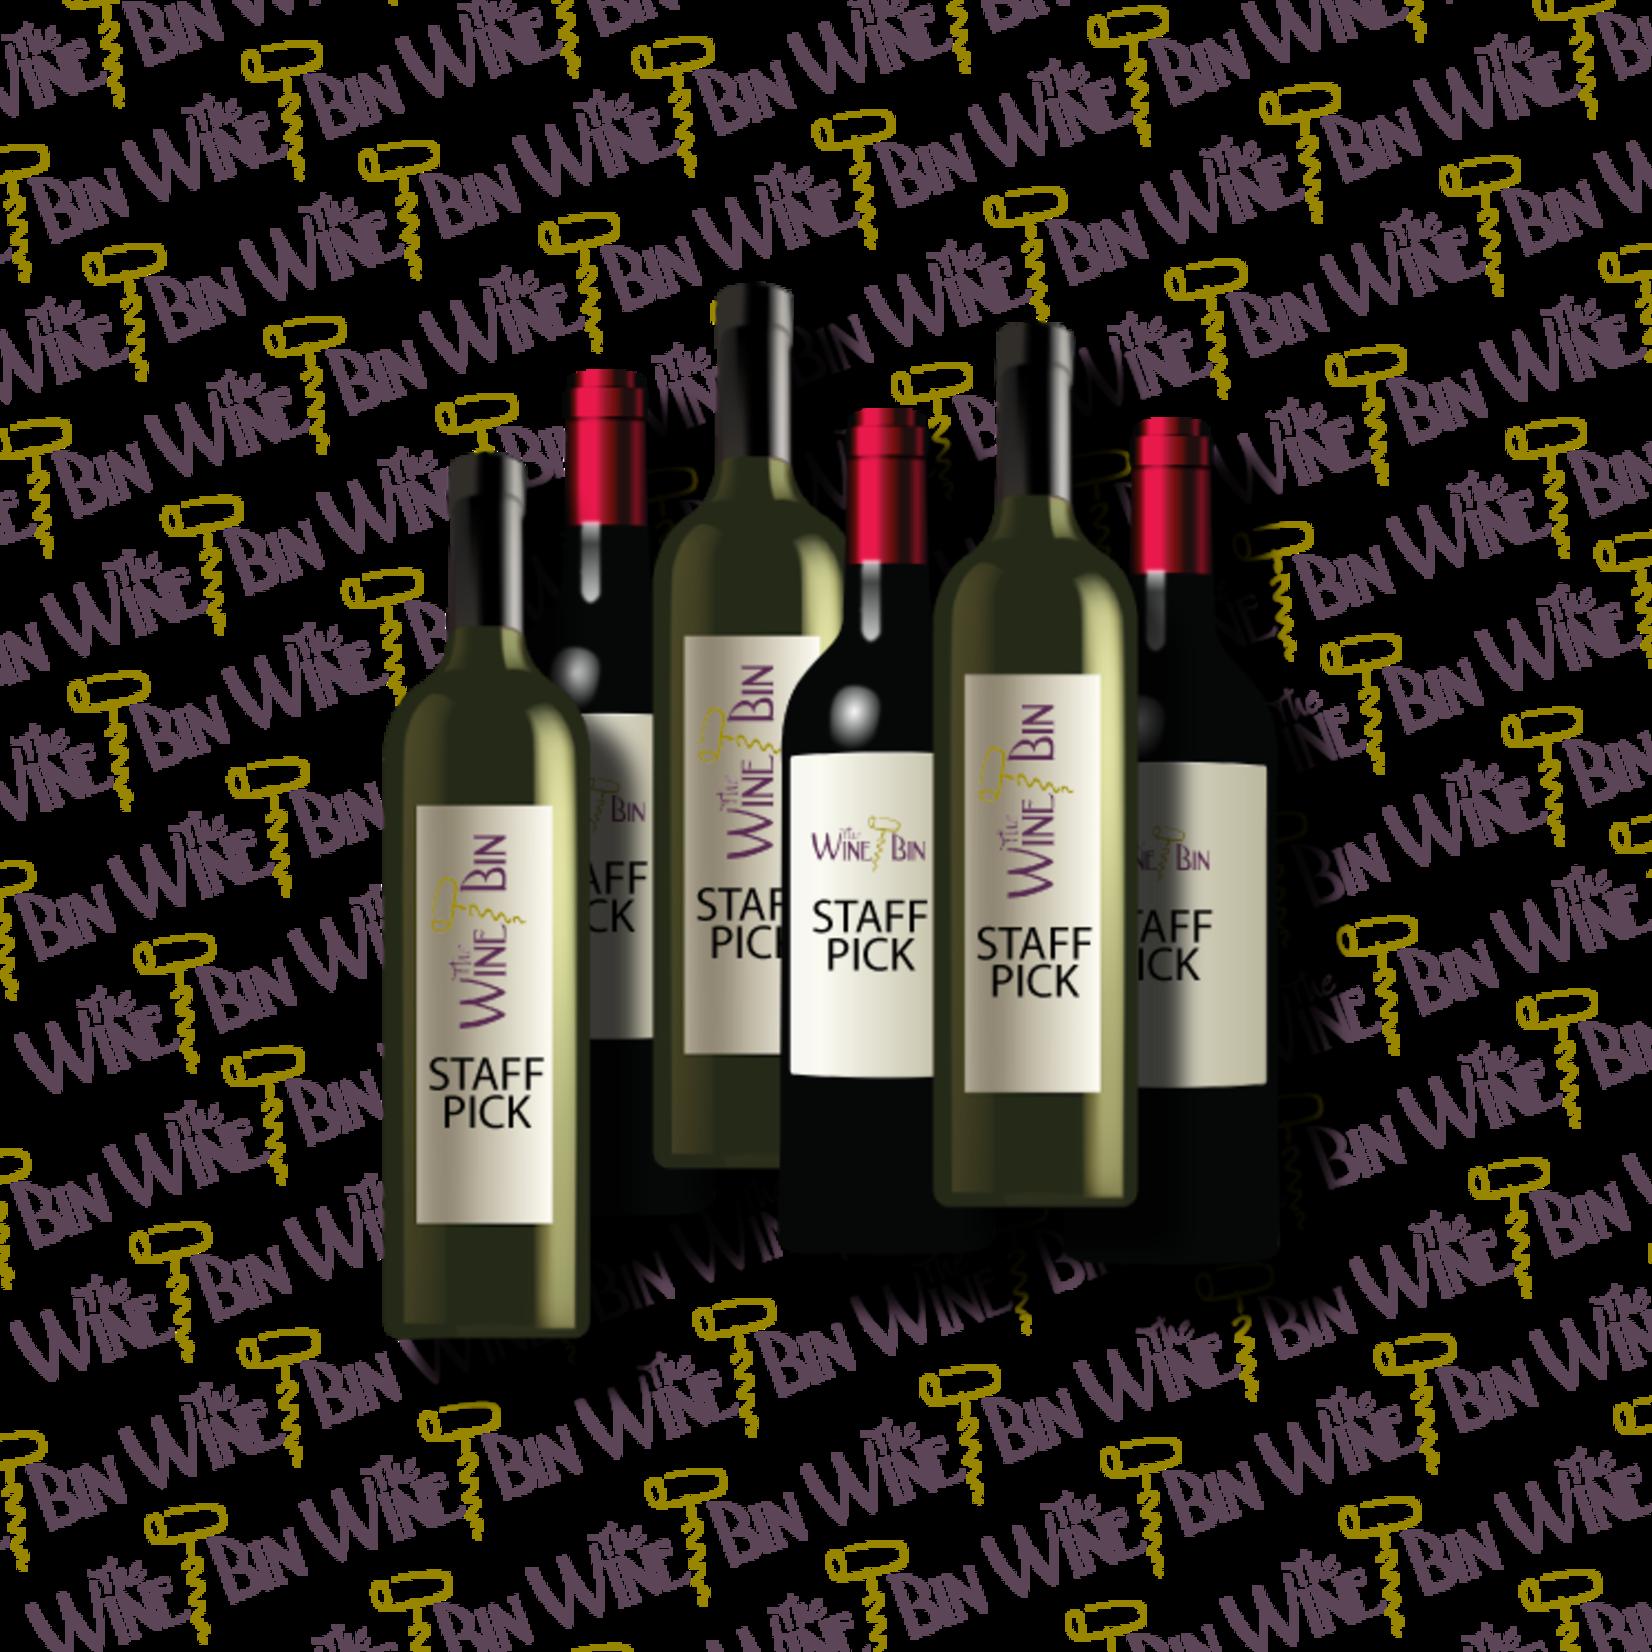 The Wine Bin STAFF 6 • MAY • The Wine Bin